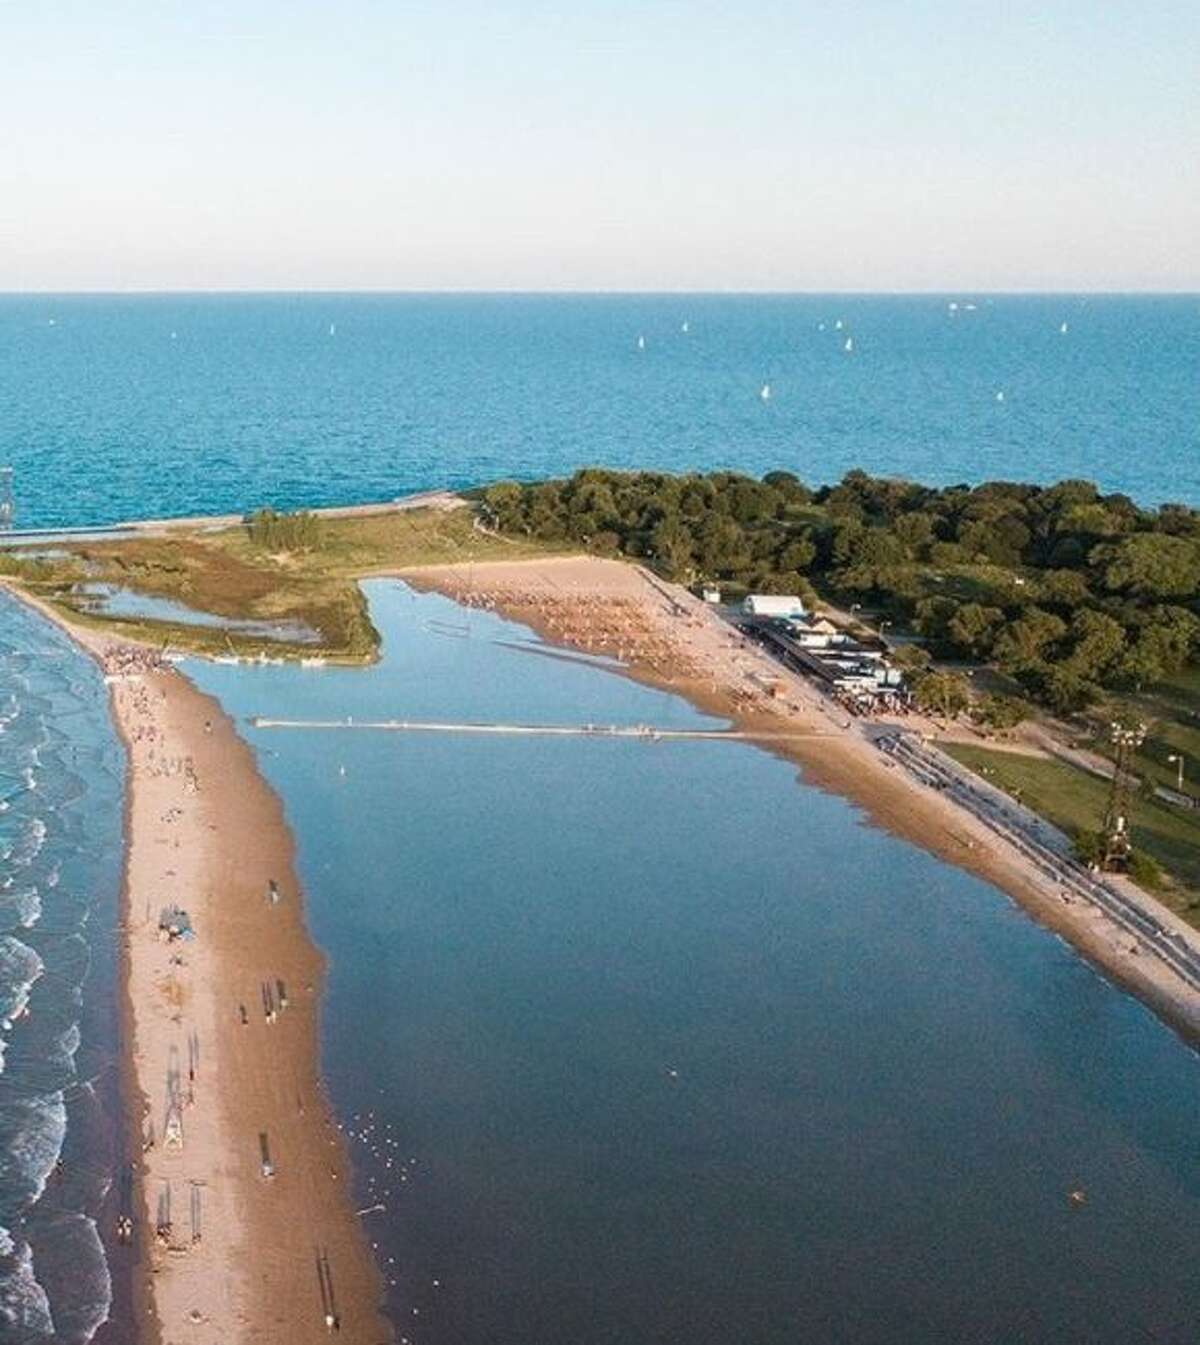 Lake Michigan covers Montrose Beach in Chicago. (Courtesy photo/Mike Killion)